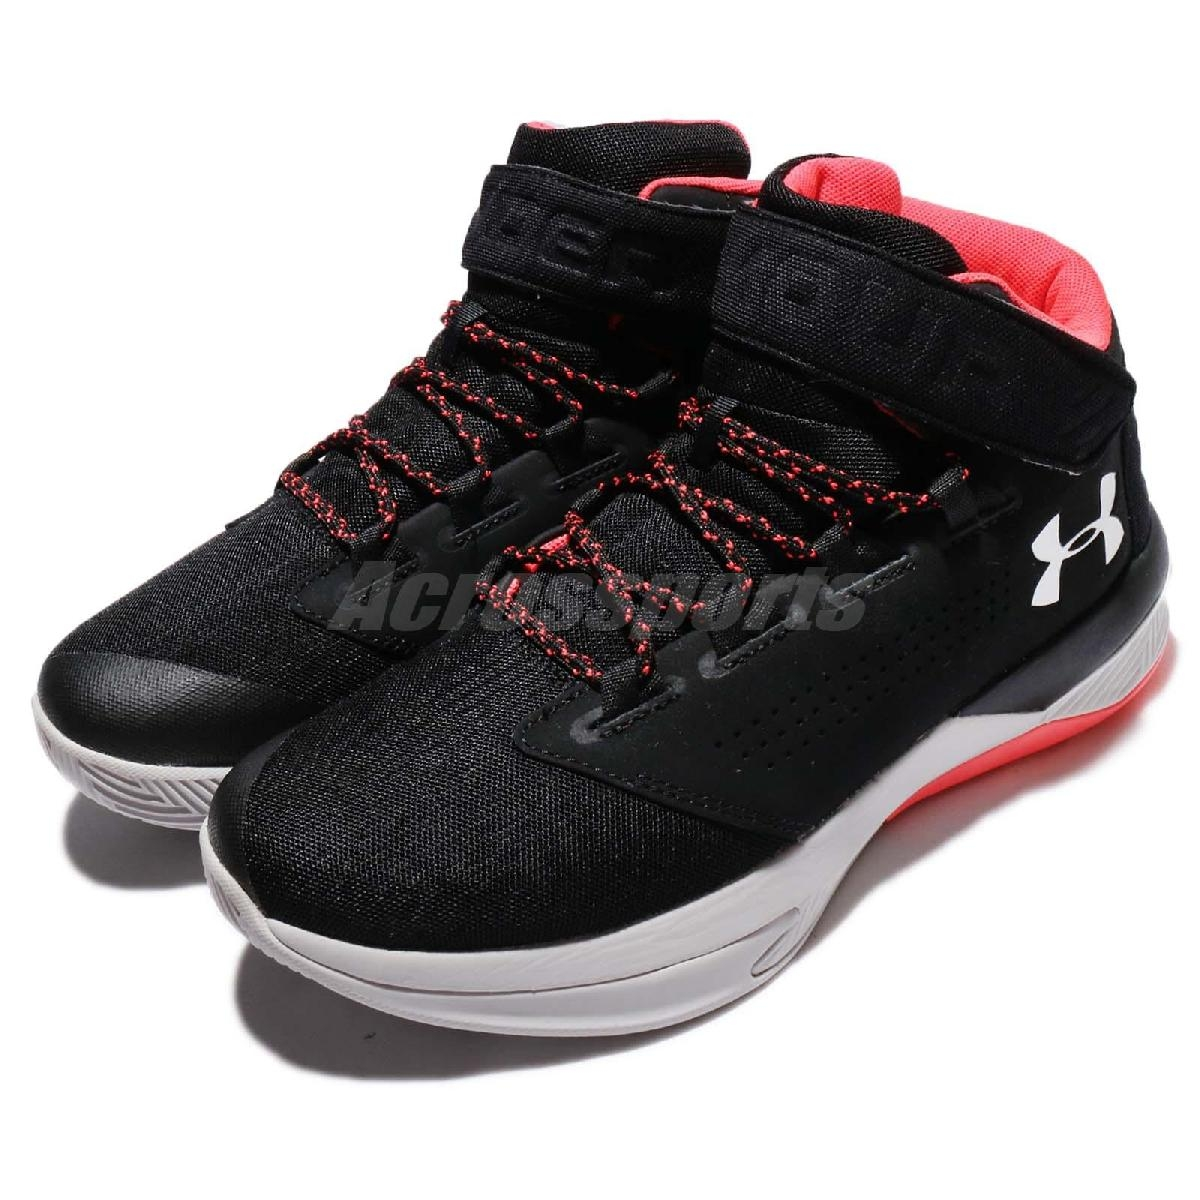 Under Armour籃球鞋UA Get B Zee黑灰運動鞋舒適腳感緩震彈力男鞋PUMP306 1298310001